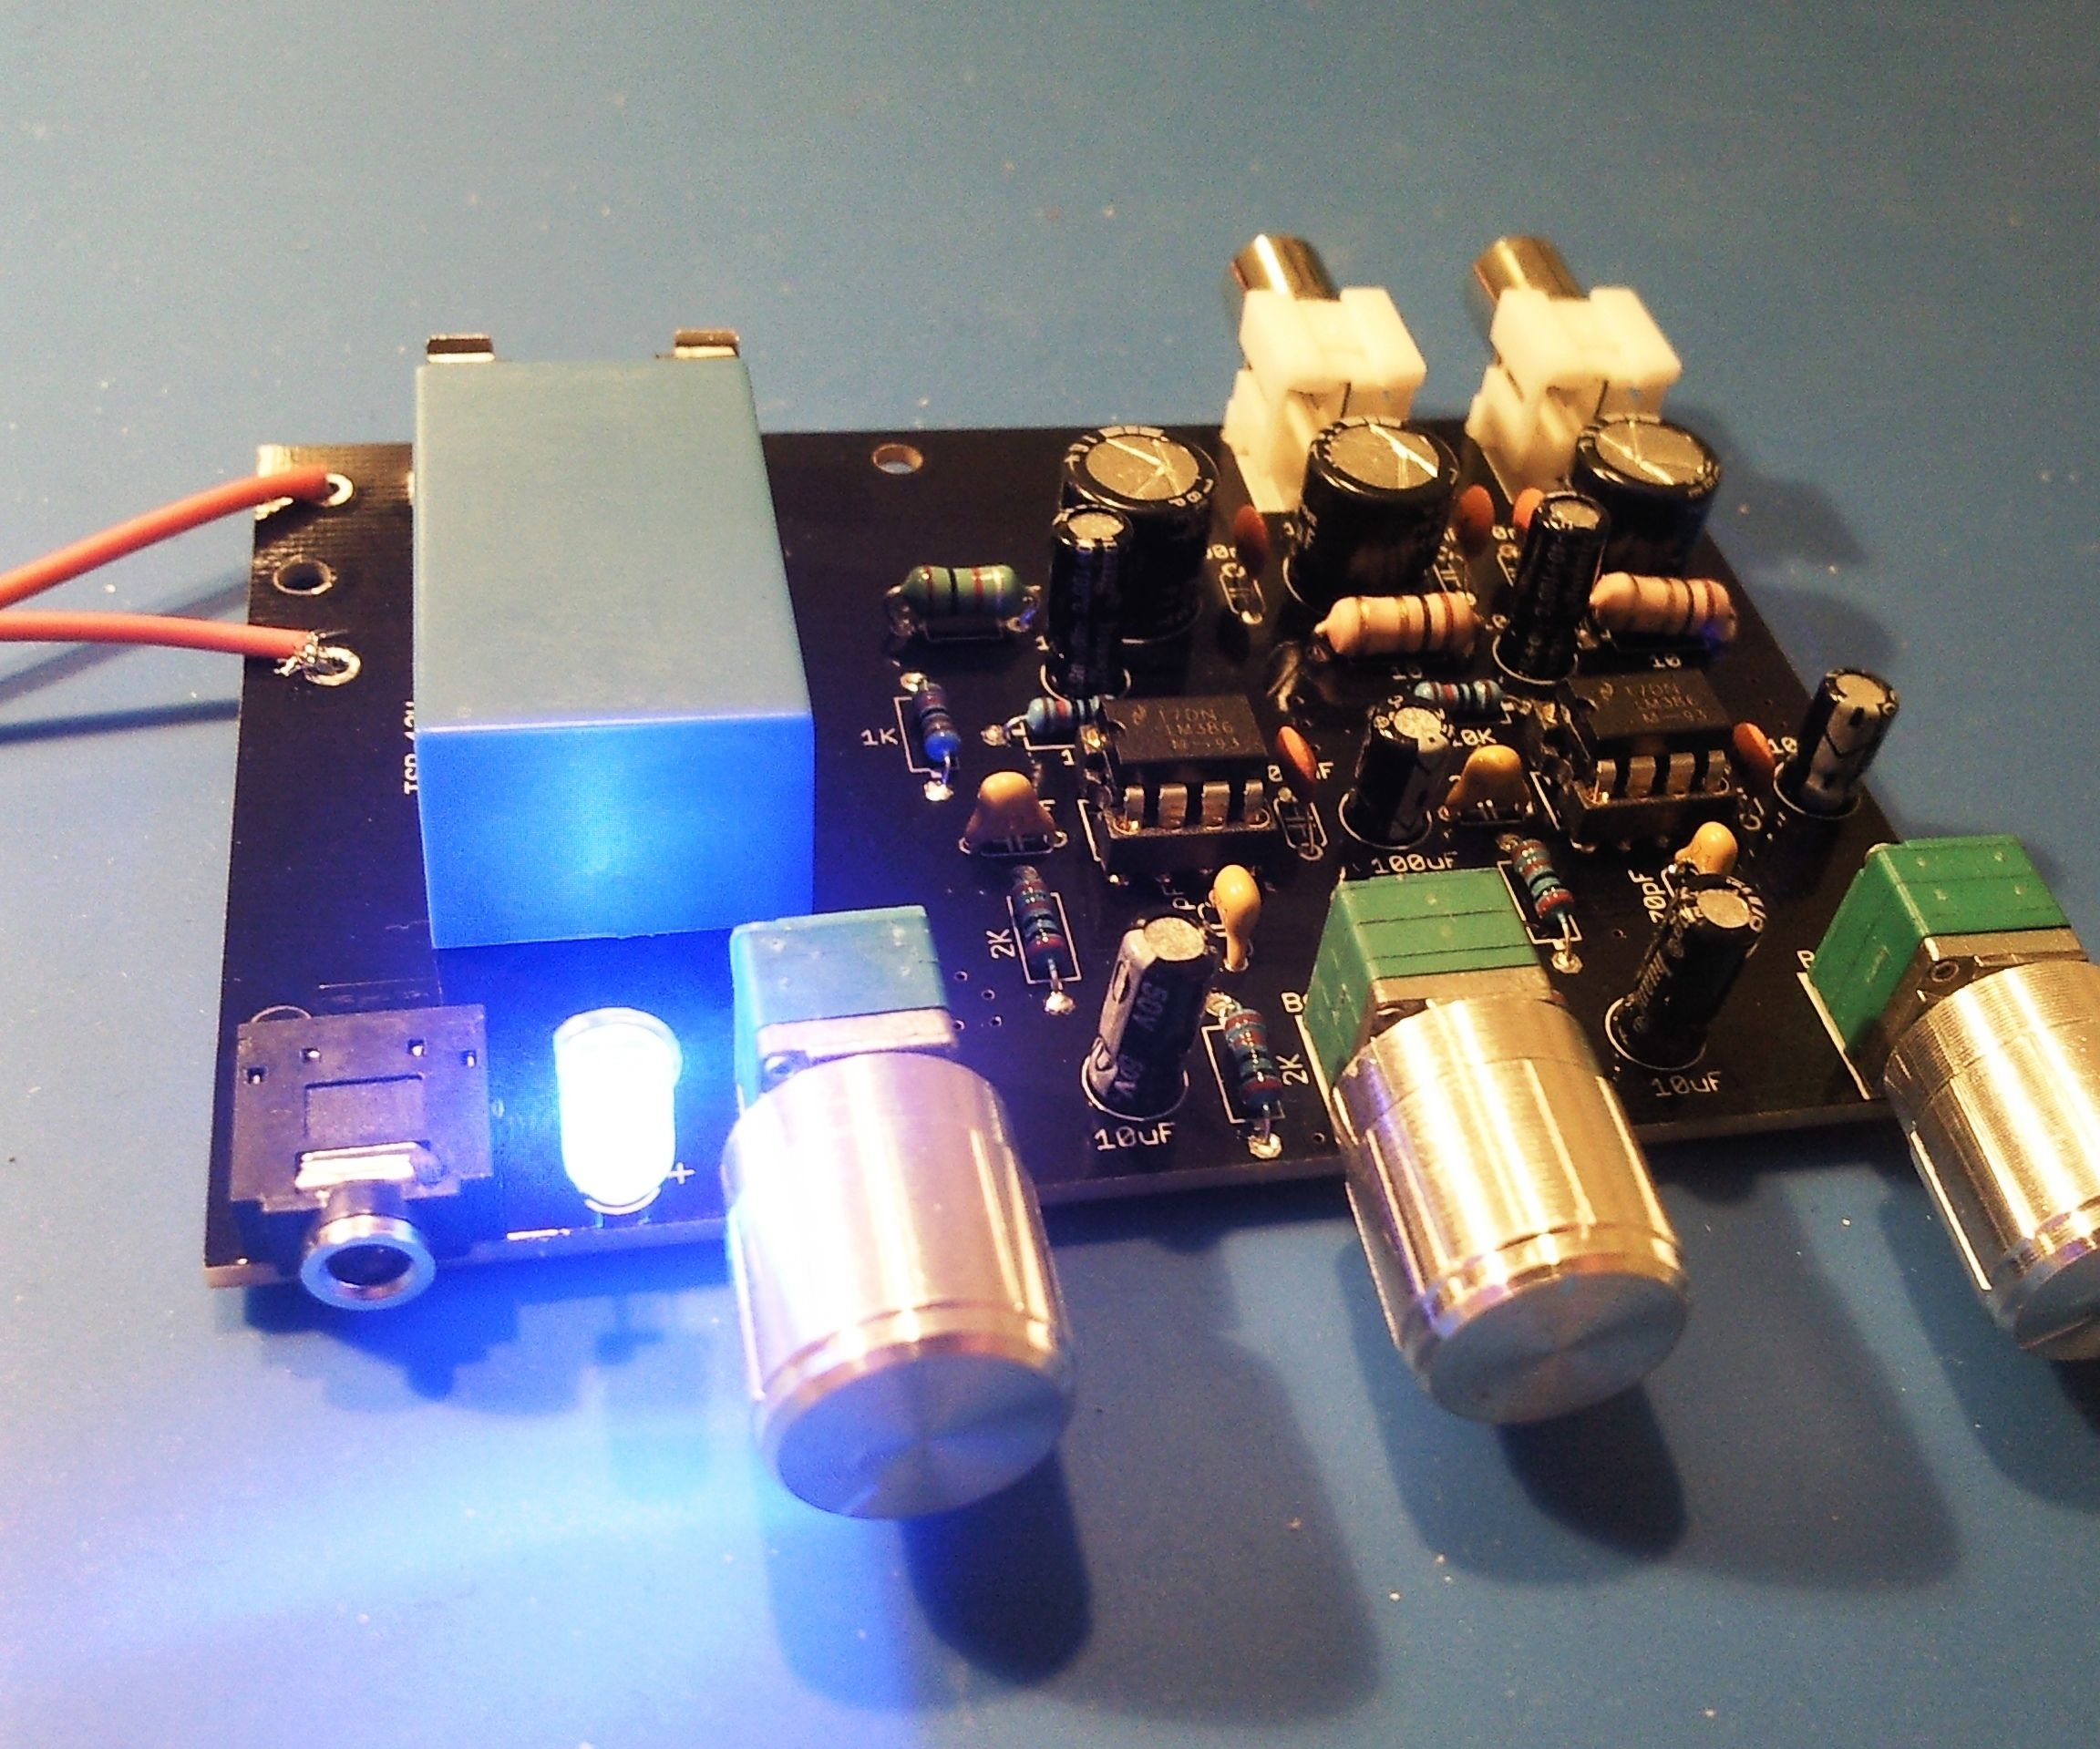 Assembling of LM386 DYI Stereo Amplifier Kit